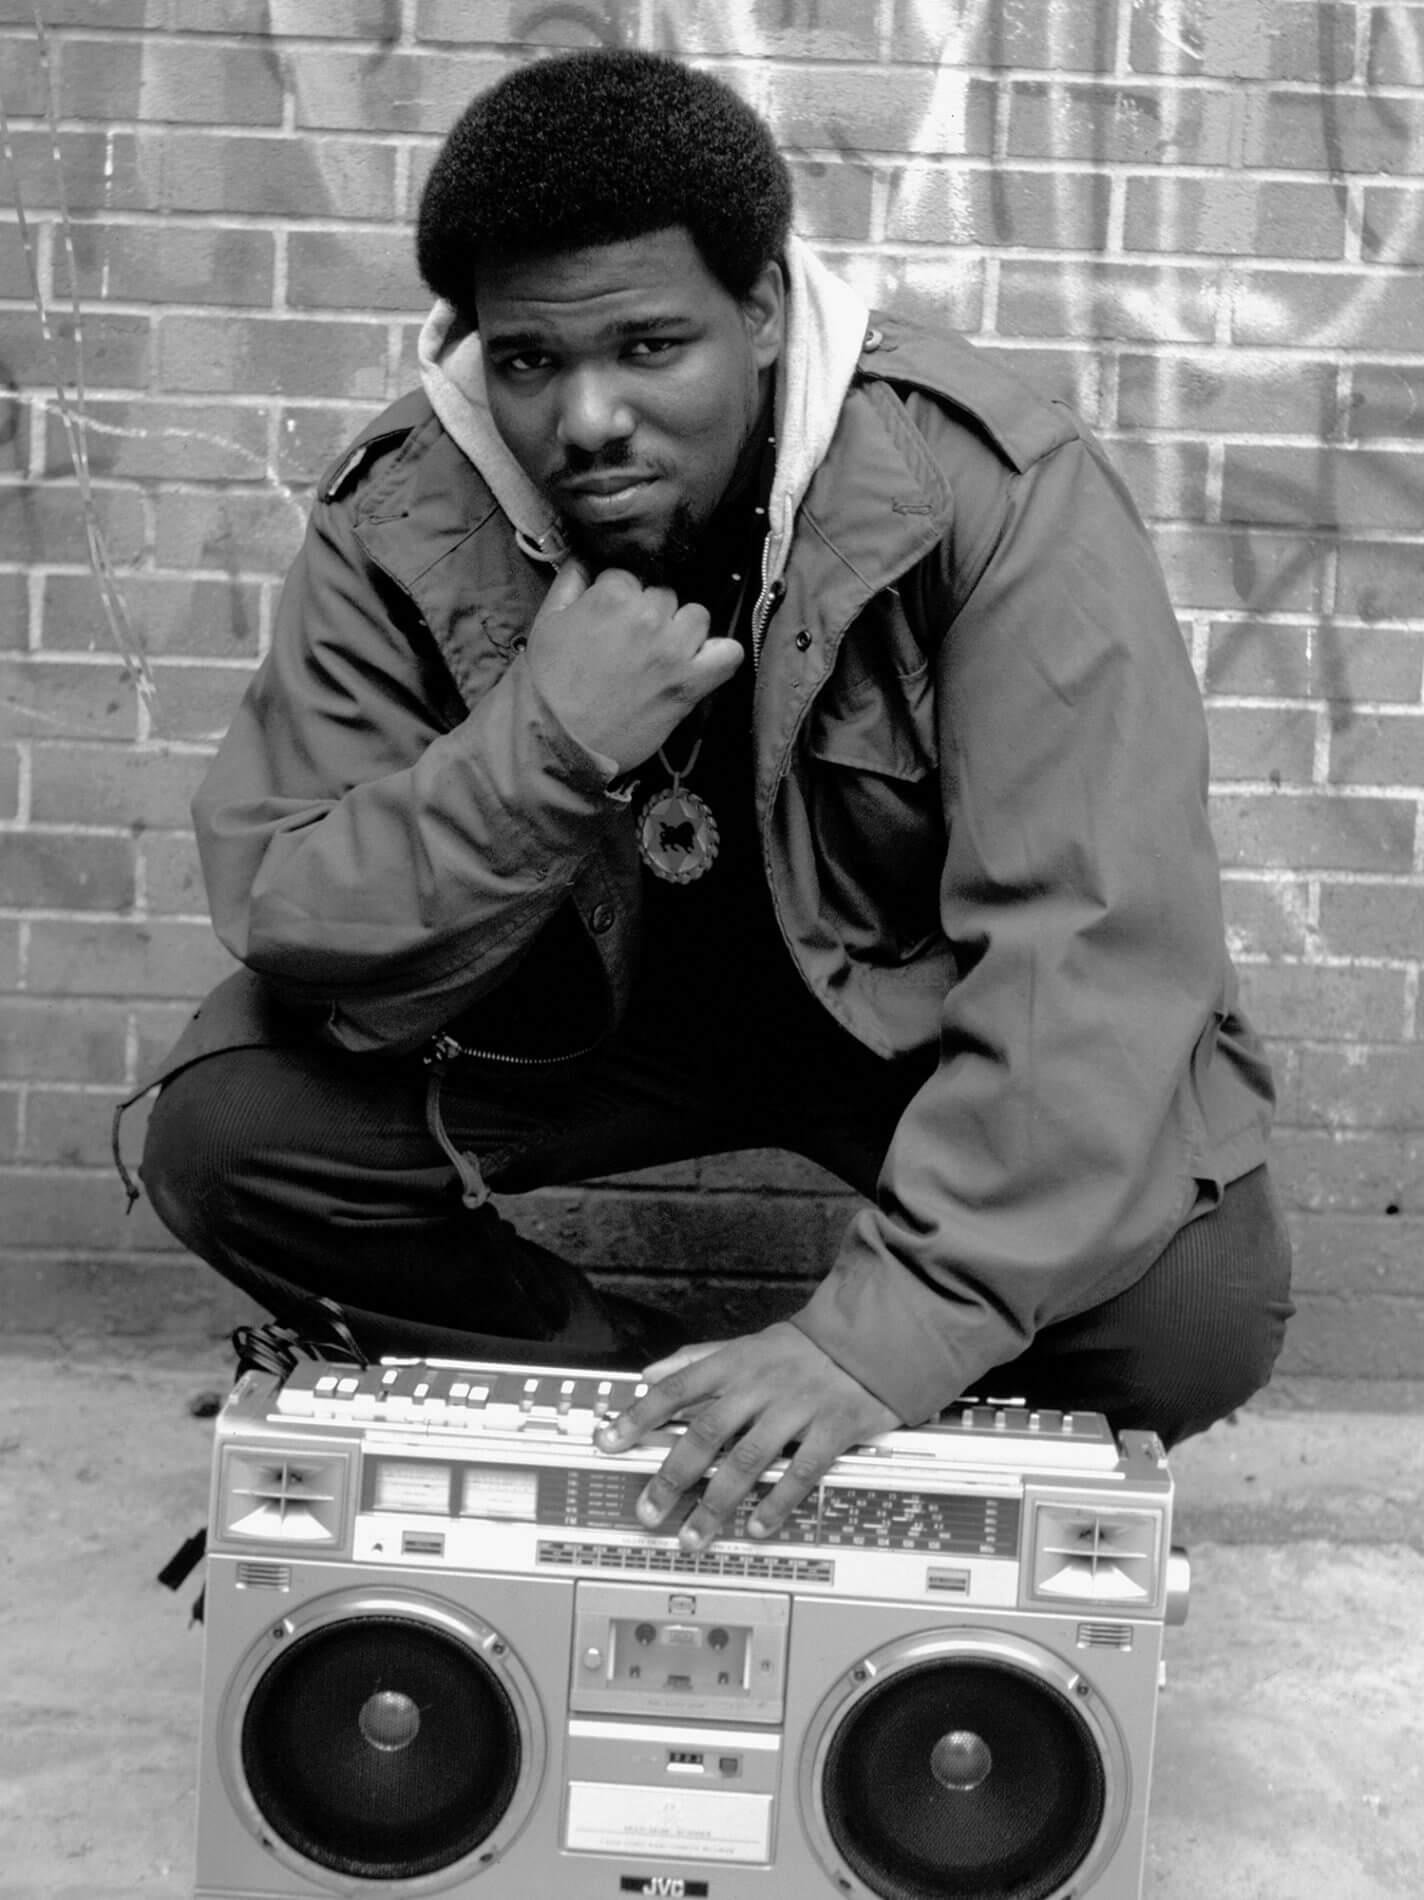 AFRIKA BAMBAATAA BRONX 1983 photography